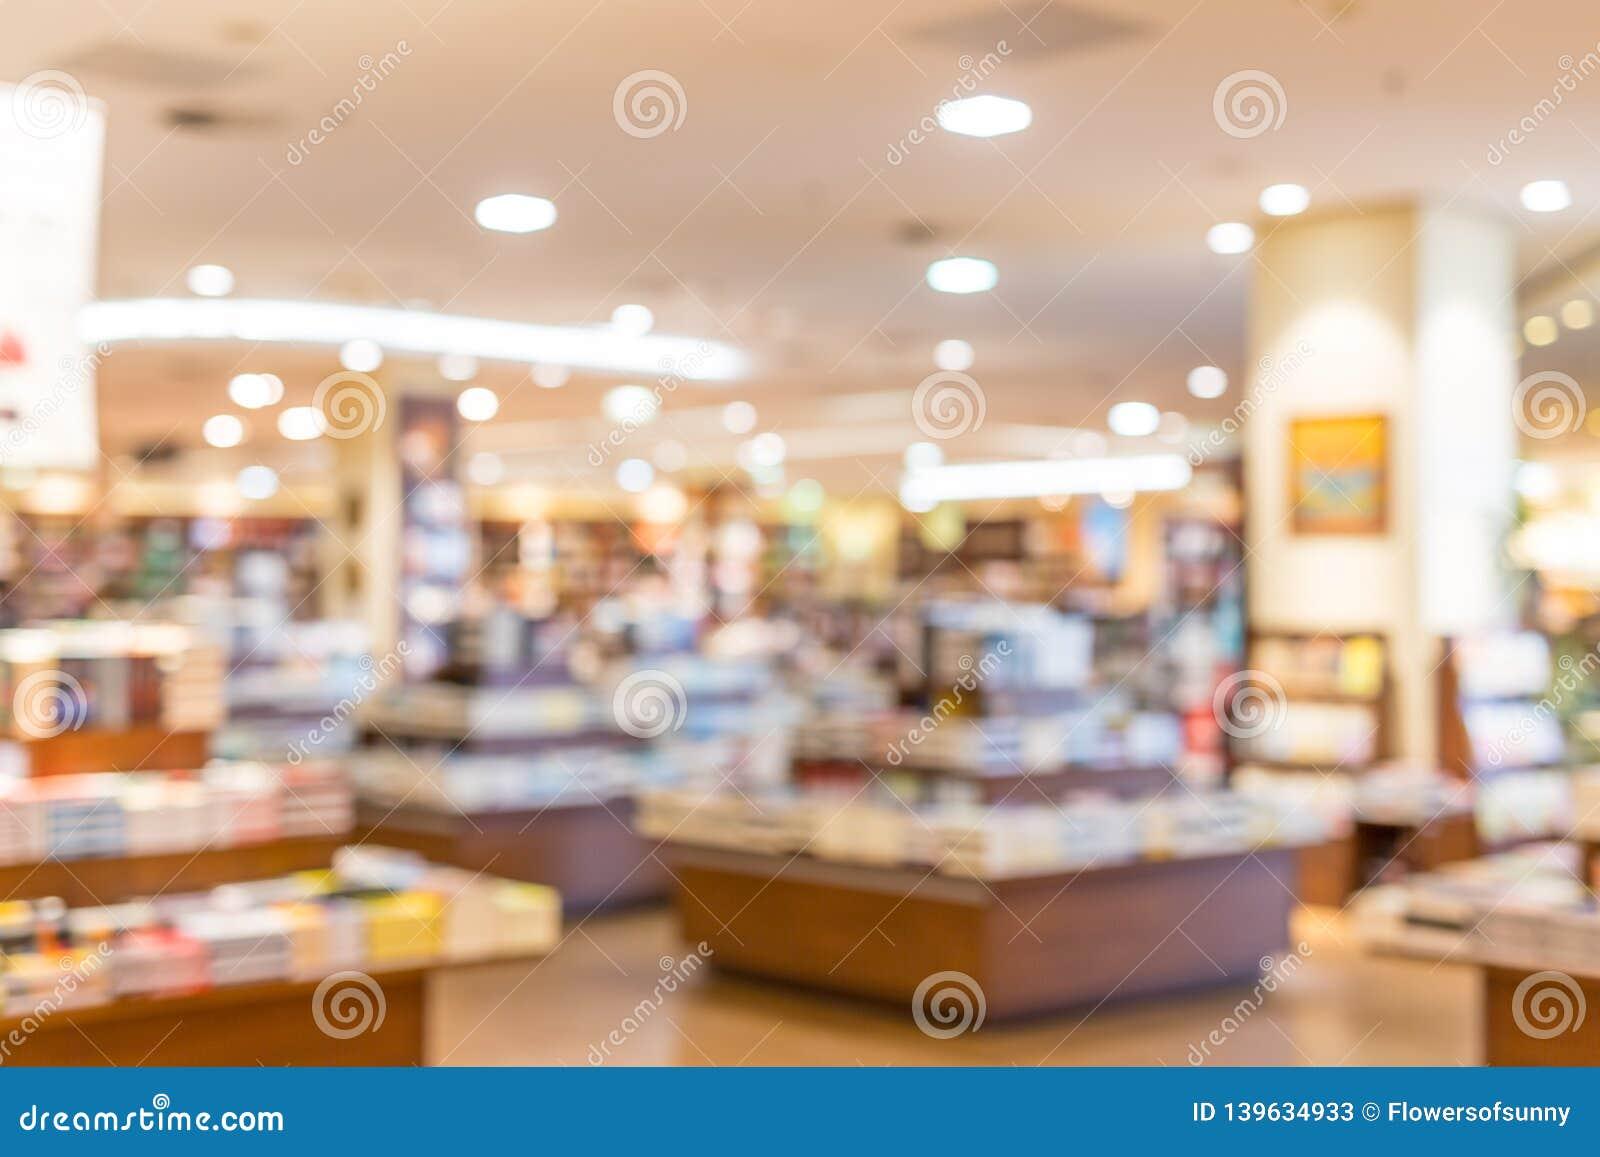 De focused, blur image of a bookstore. Bookstore background